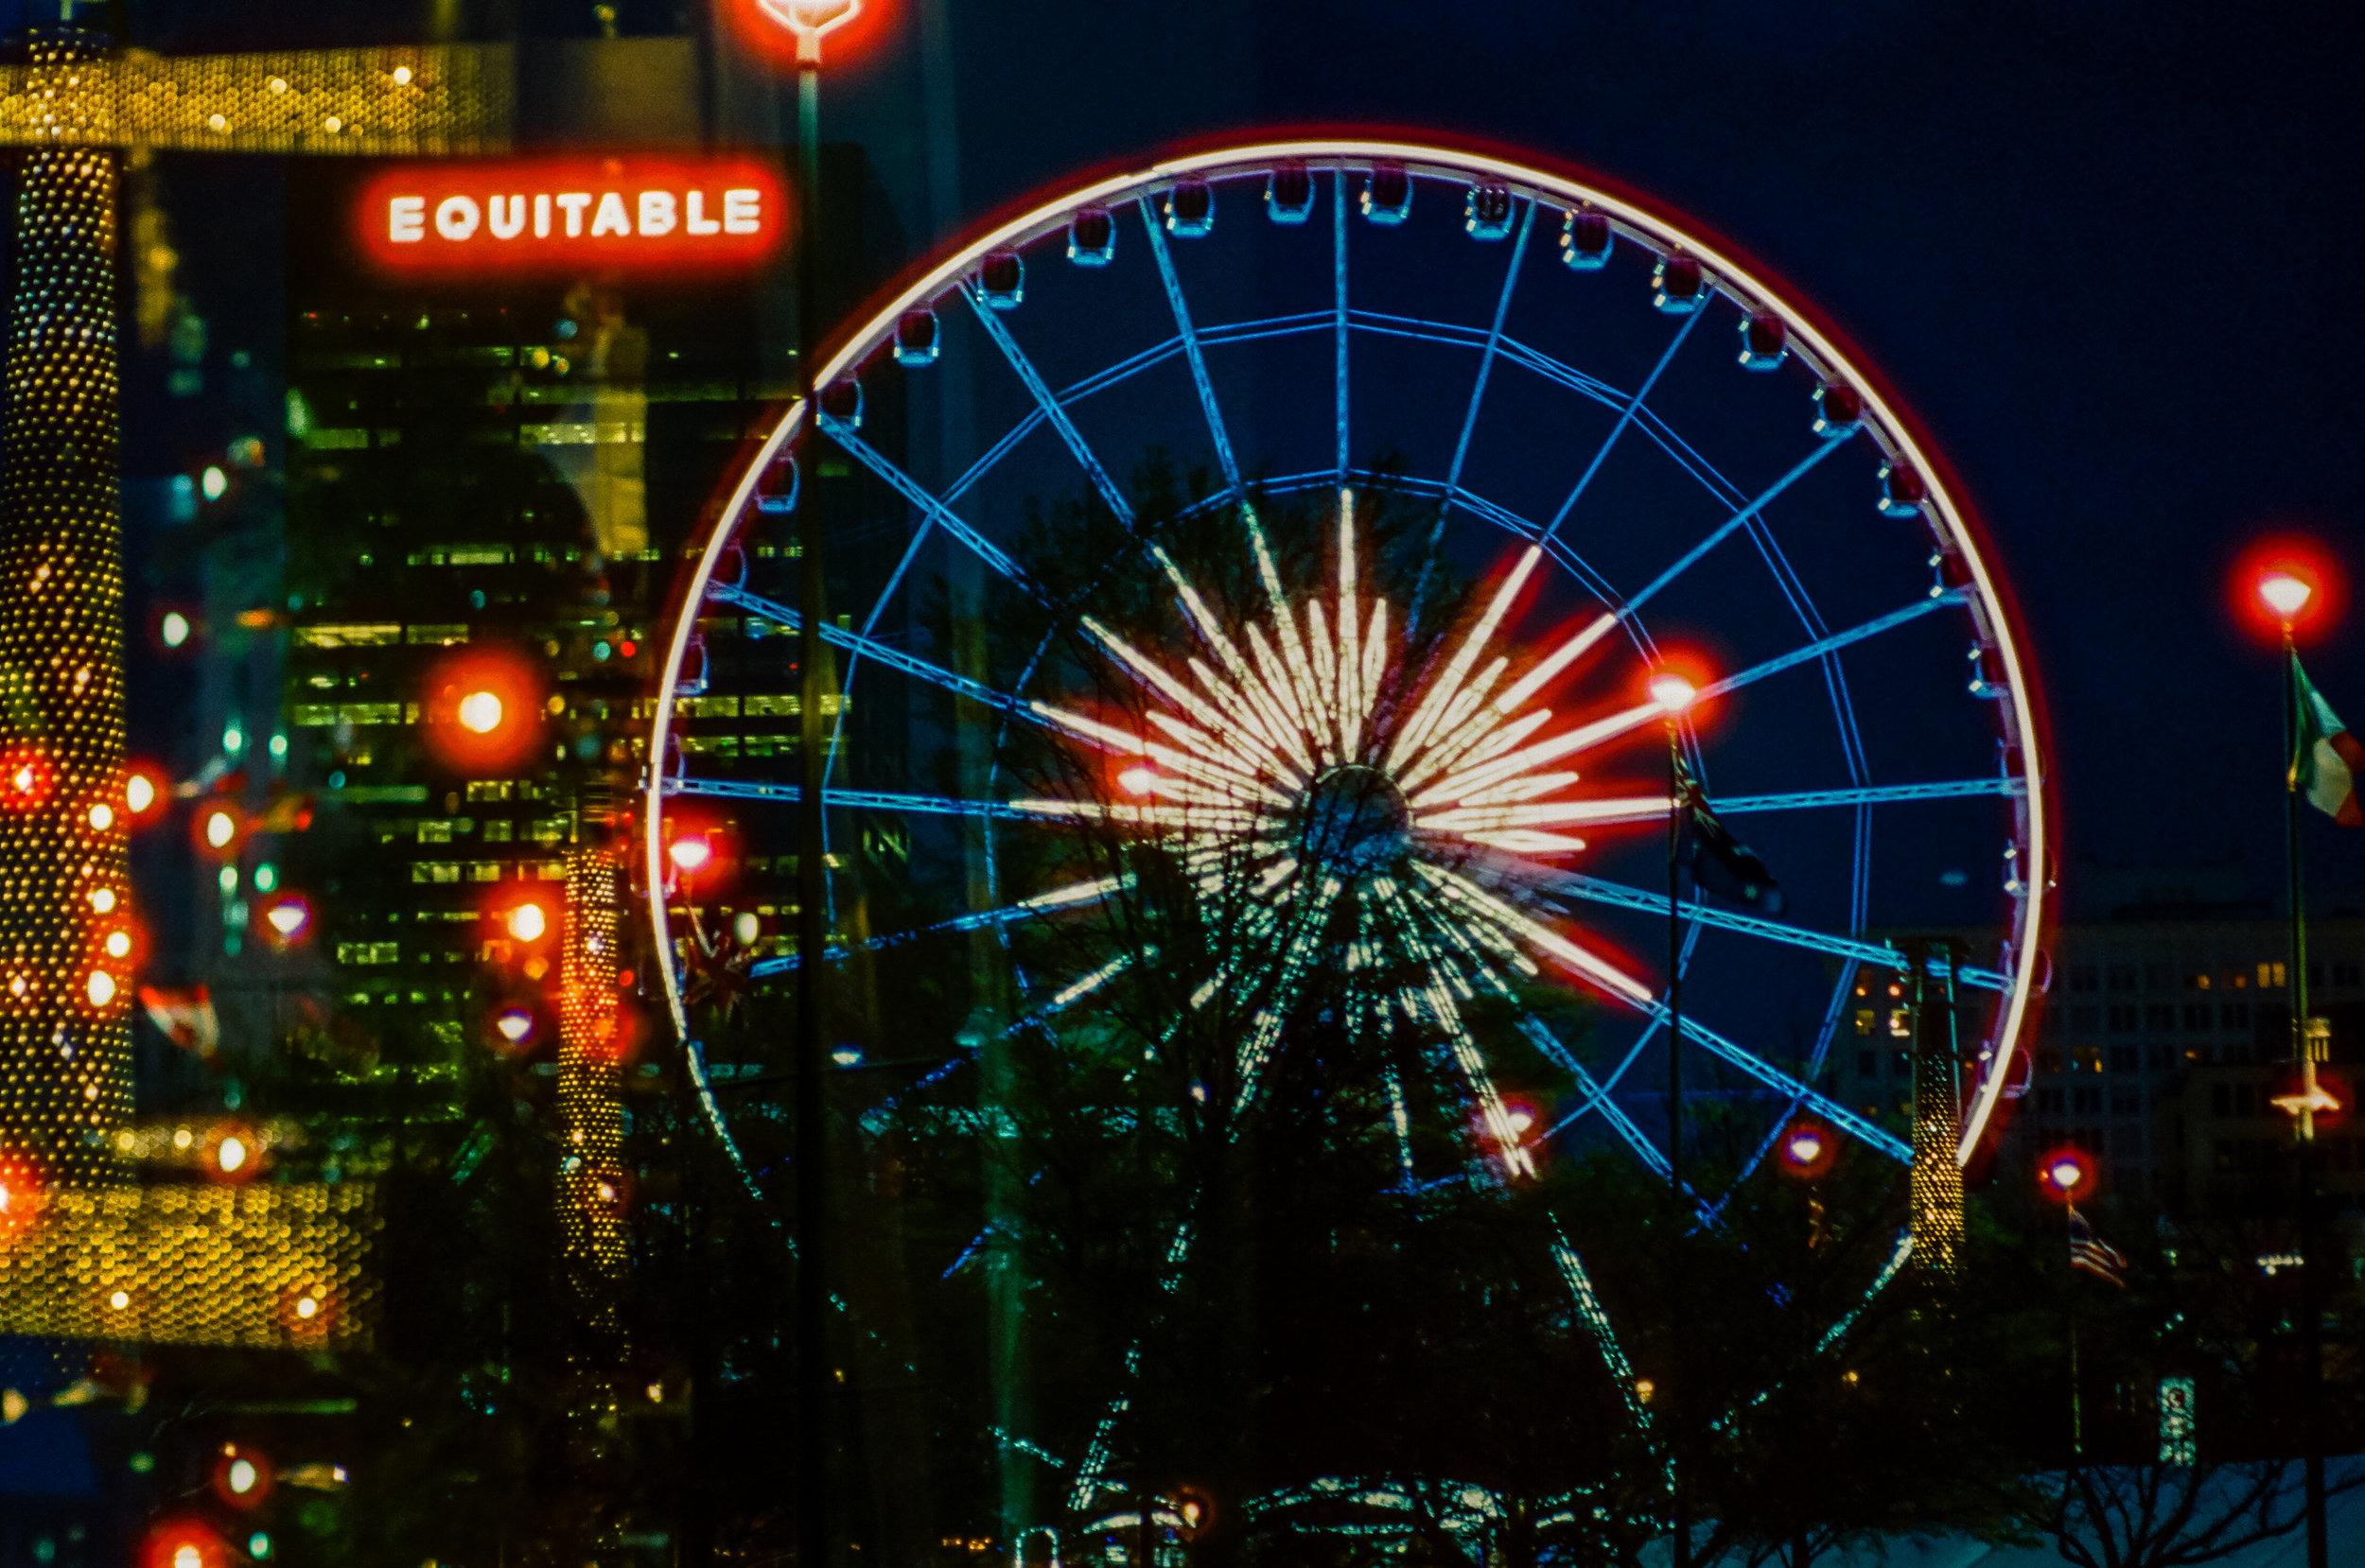 AtlantaNights_PentaxSpotmaticF_SuperTakumar50mmF1_4_Cinestill800T_MichaelFauscette.jpg